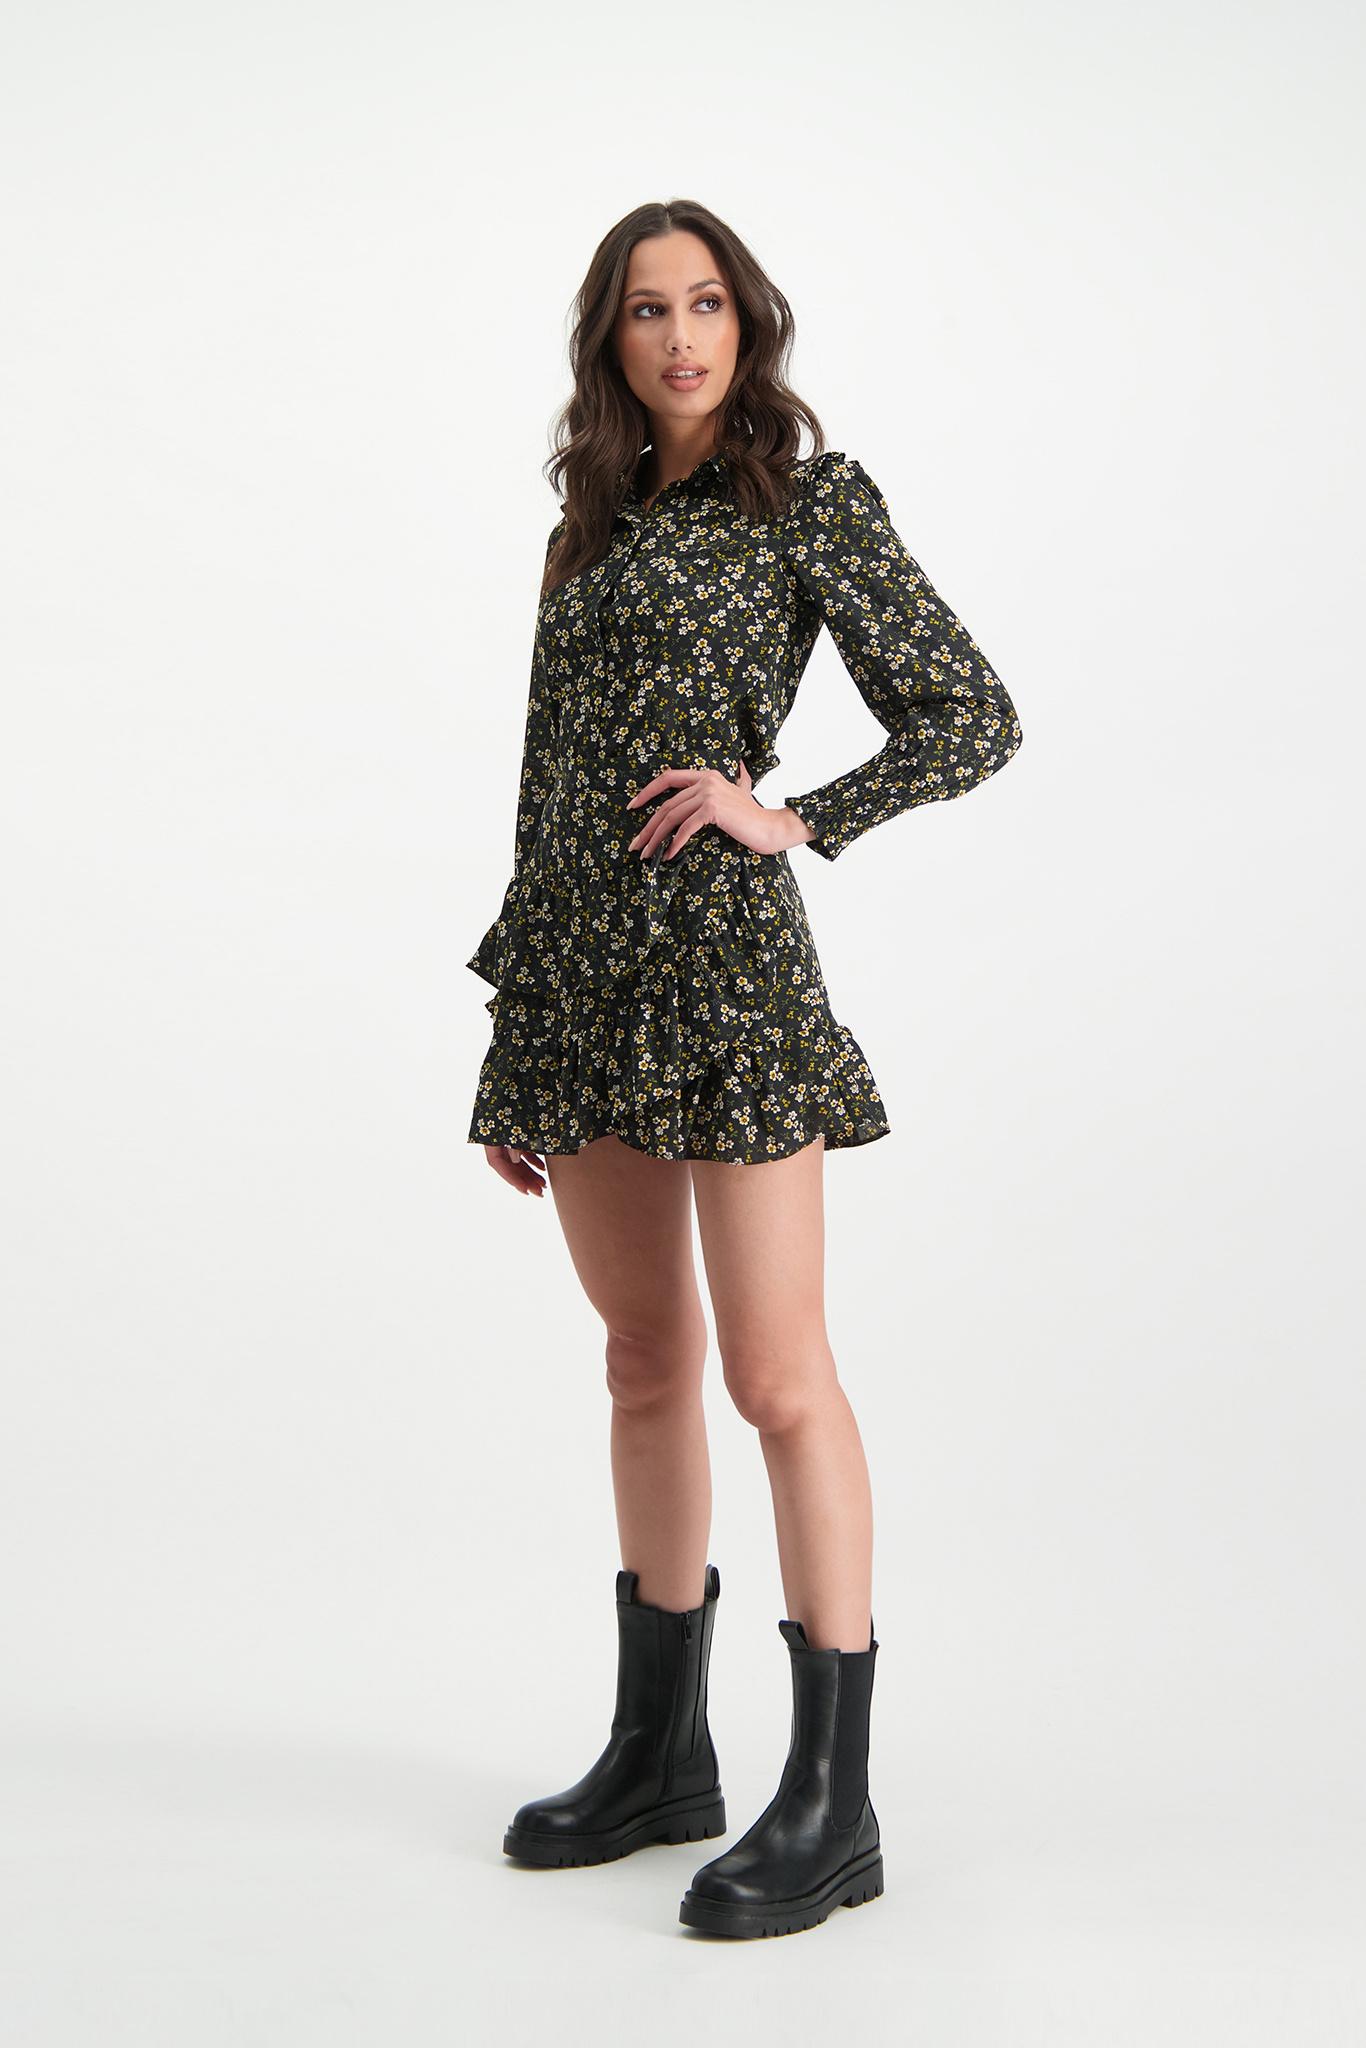 Lofty Manner Black & Yellow Floral Print Skirt Ivana